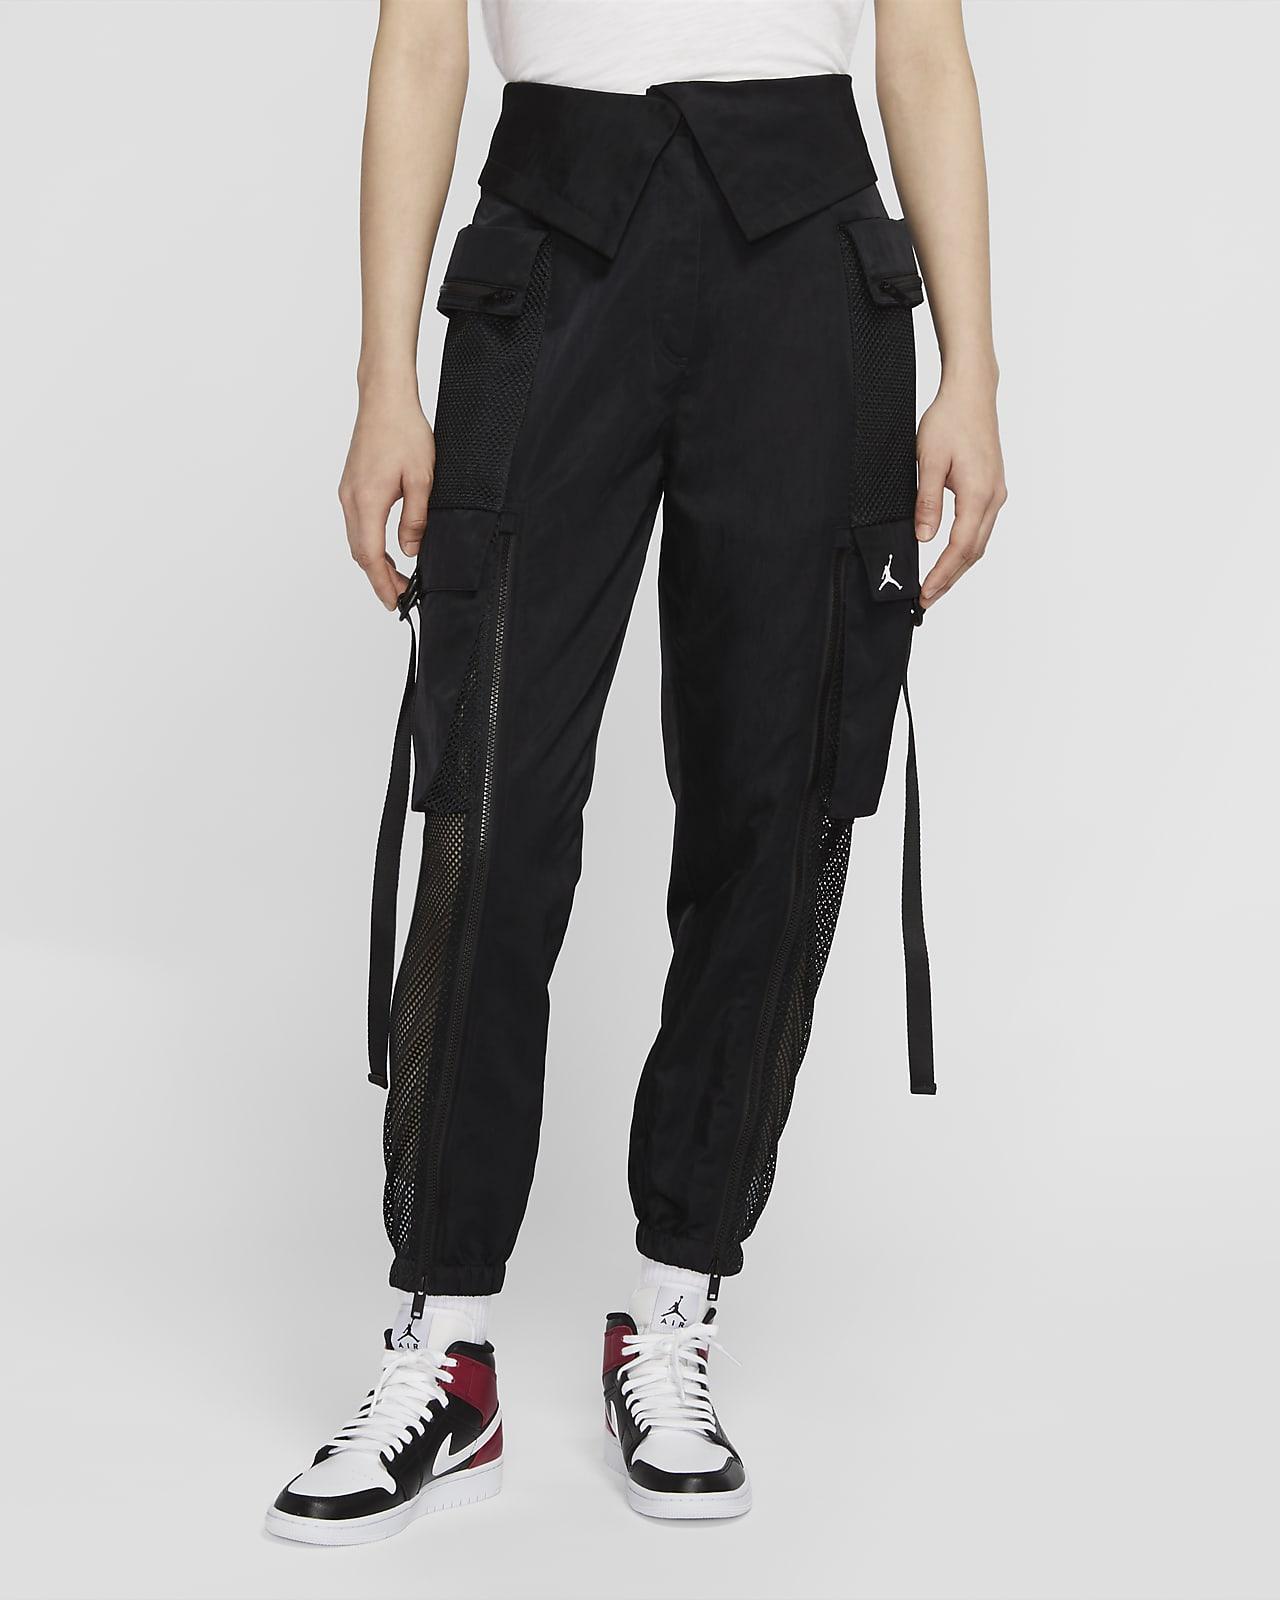 Jordan Utility Pantalon Mujer Nike Es